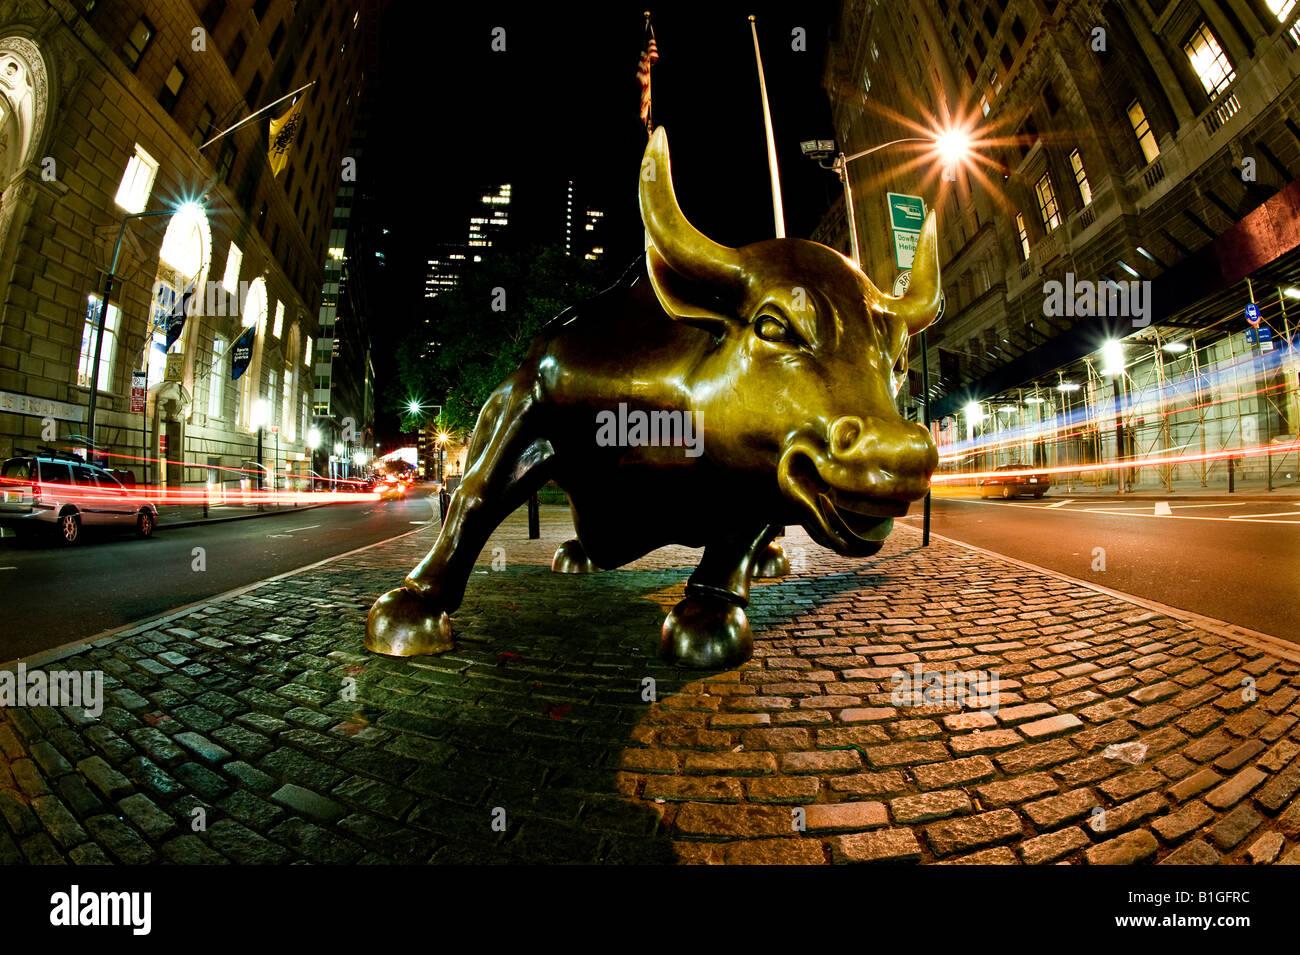 The Wall Street Bull at night - Stock Image